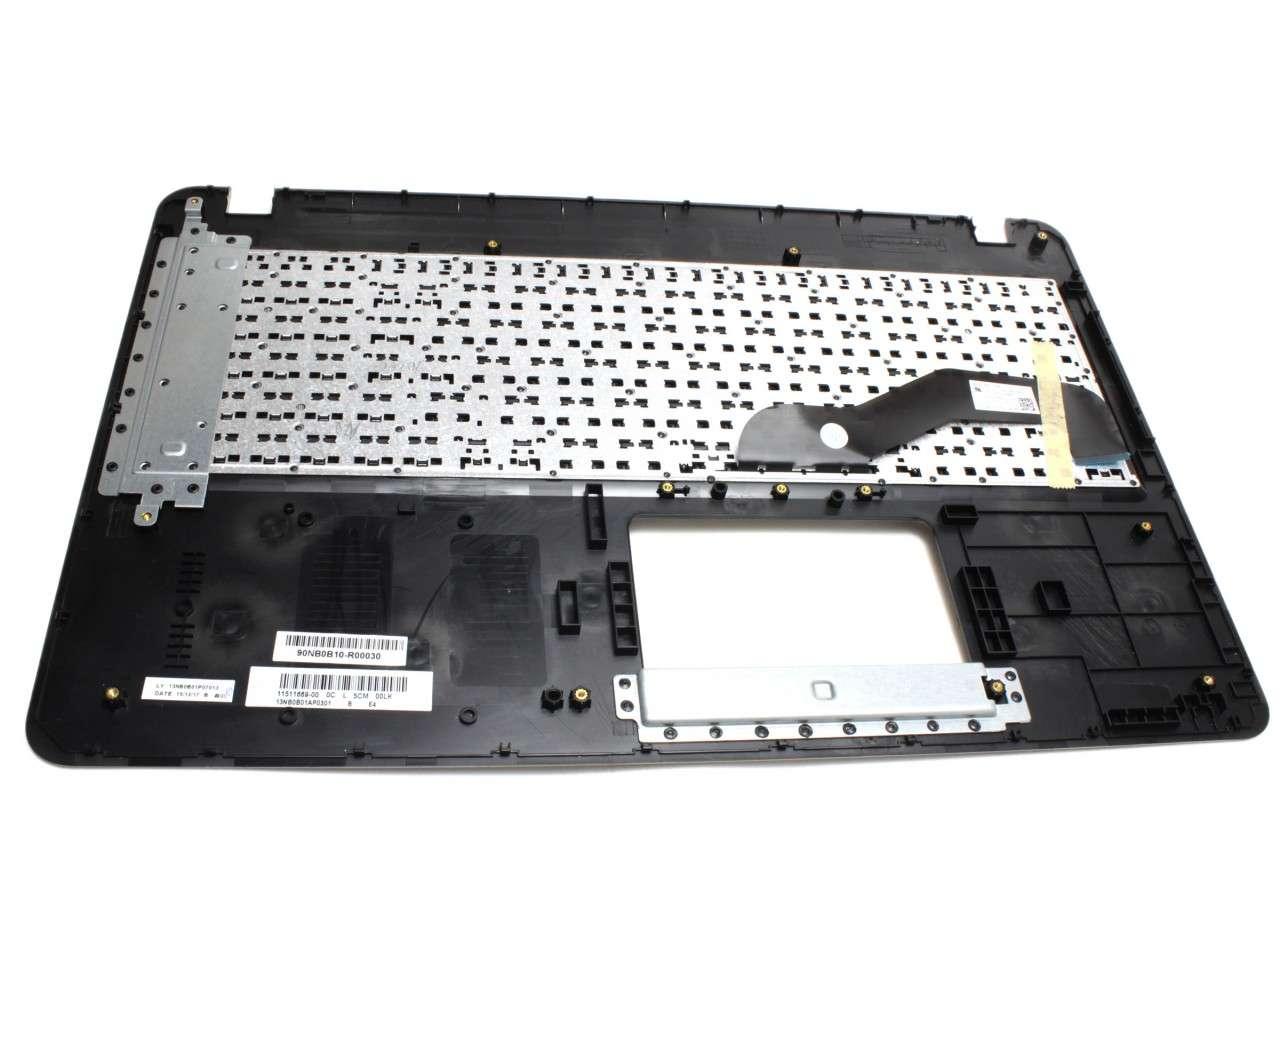 Tastatura Asus A540SC neagra cu Palmrest auriu imagine